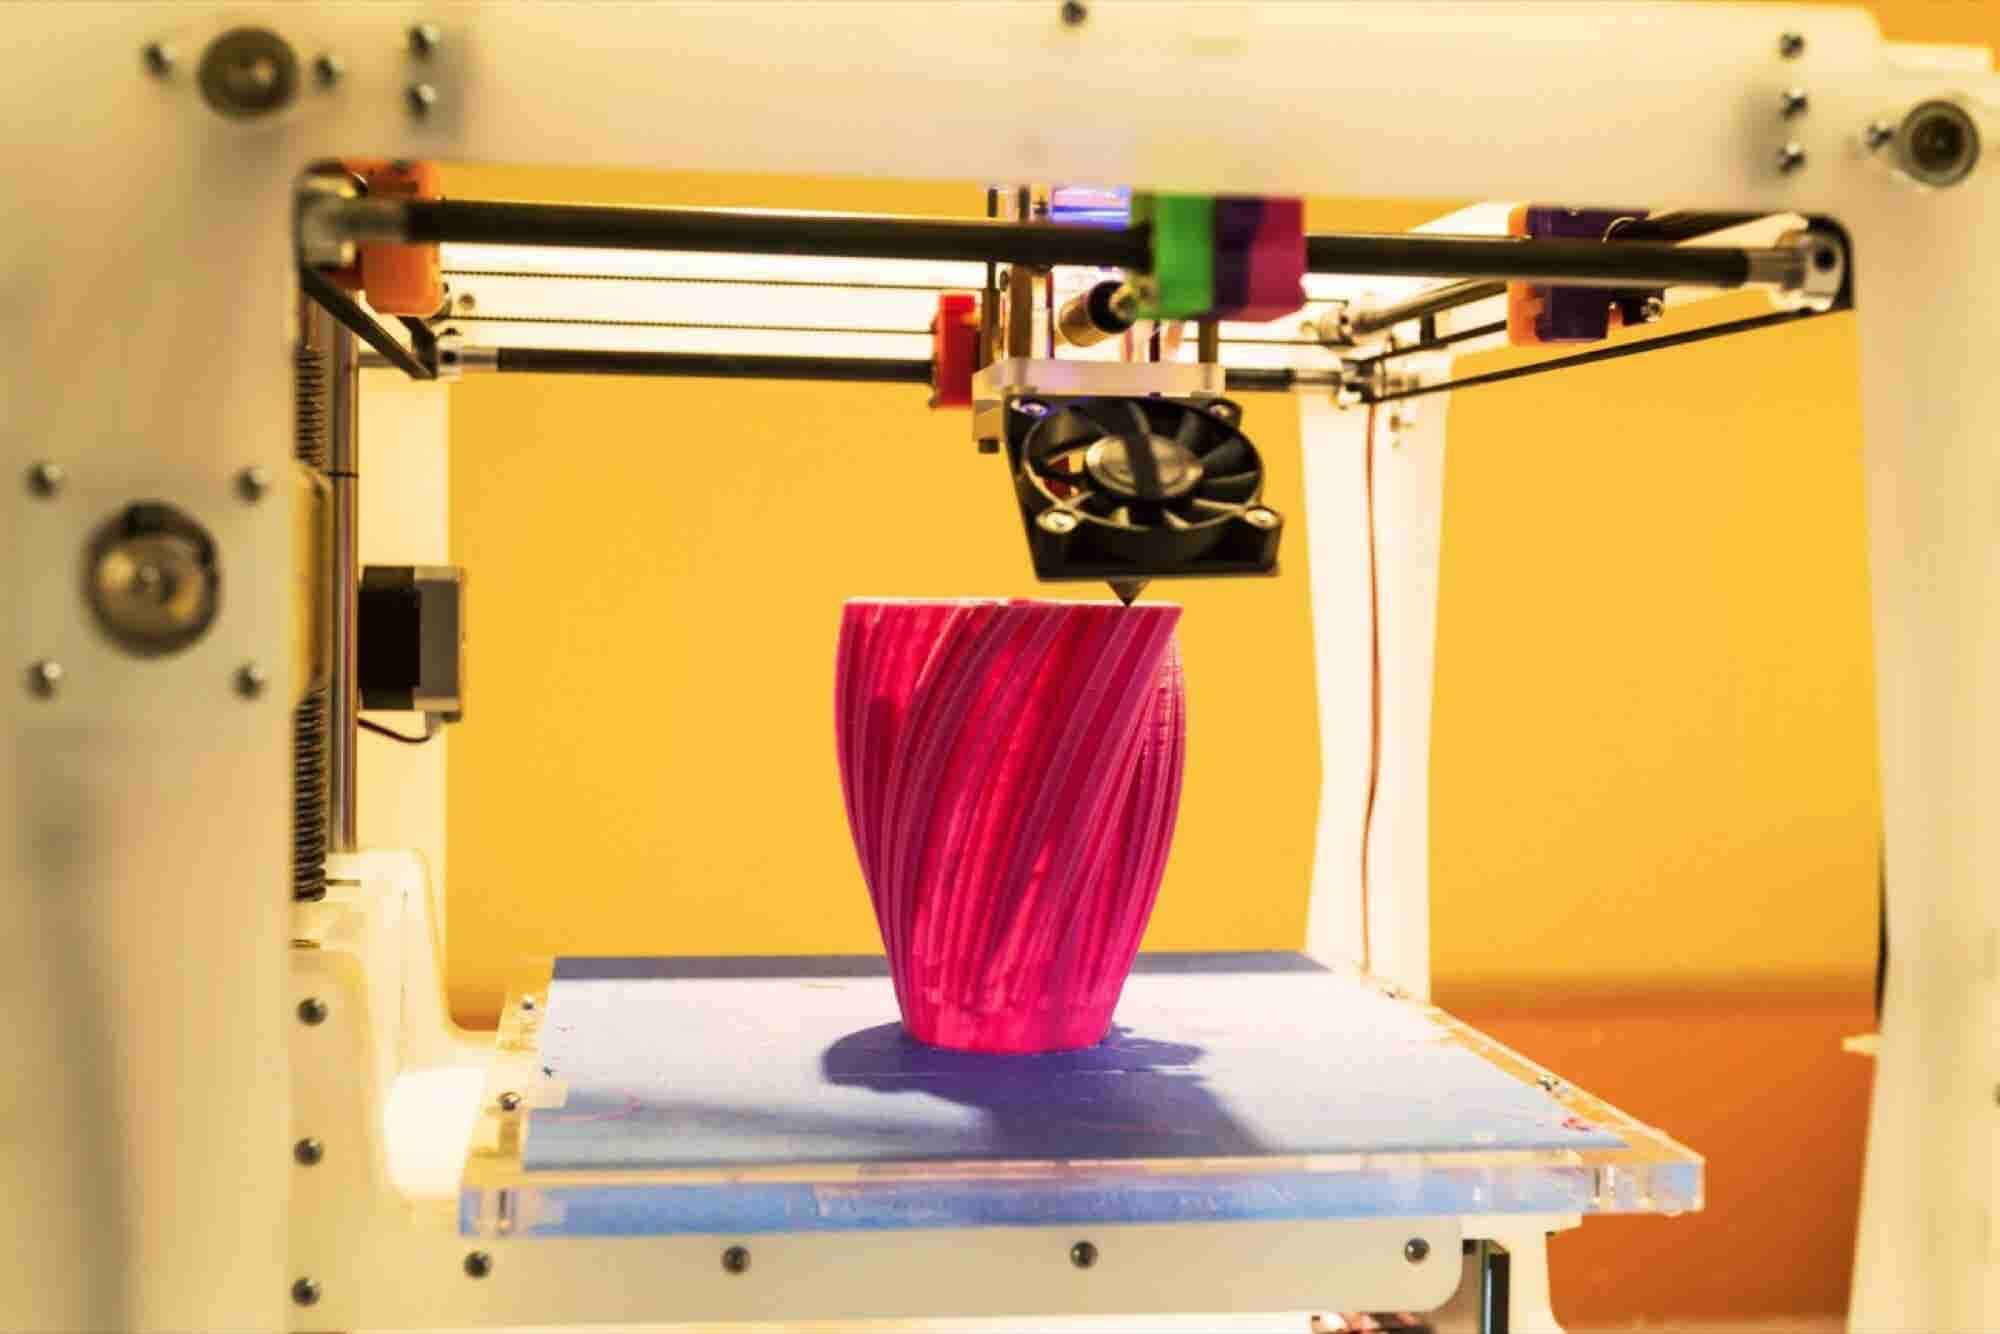 Cómo montar un centro de impresión 3D